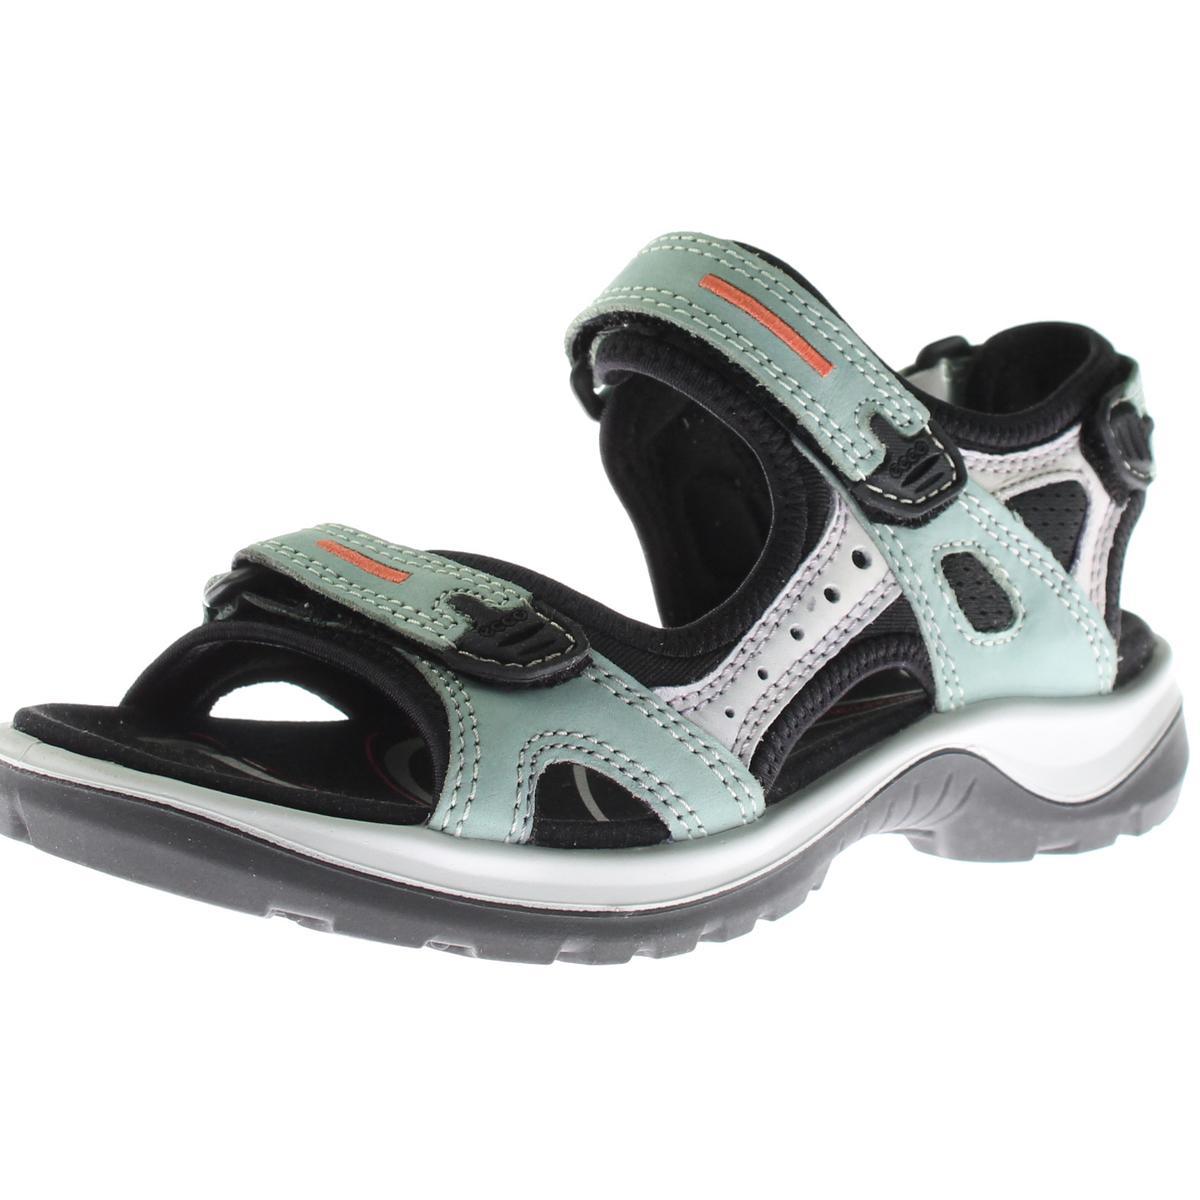 Ecco Womens Yucatan Open Toe Casual Sport Sandals